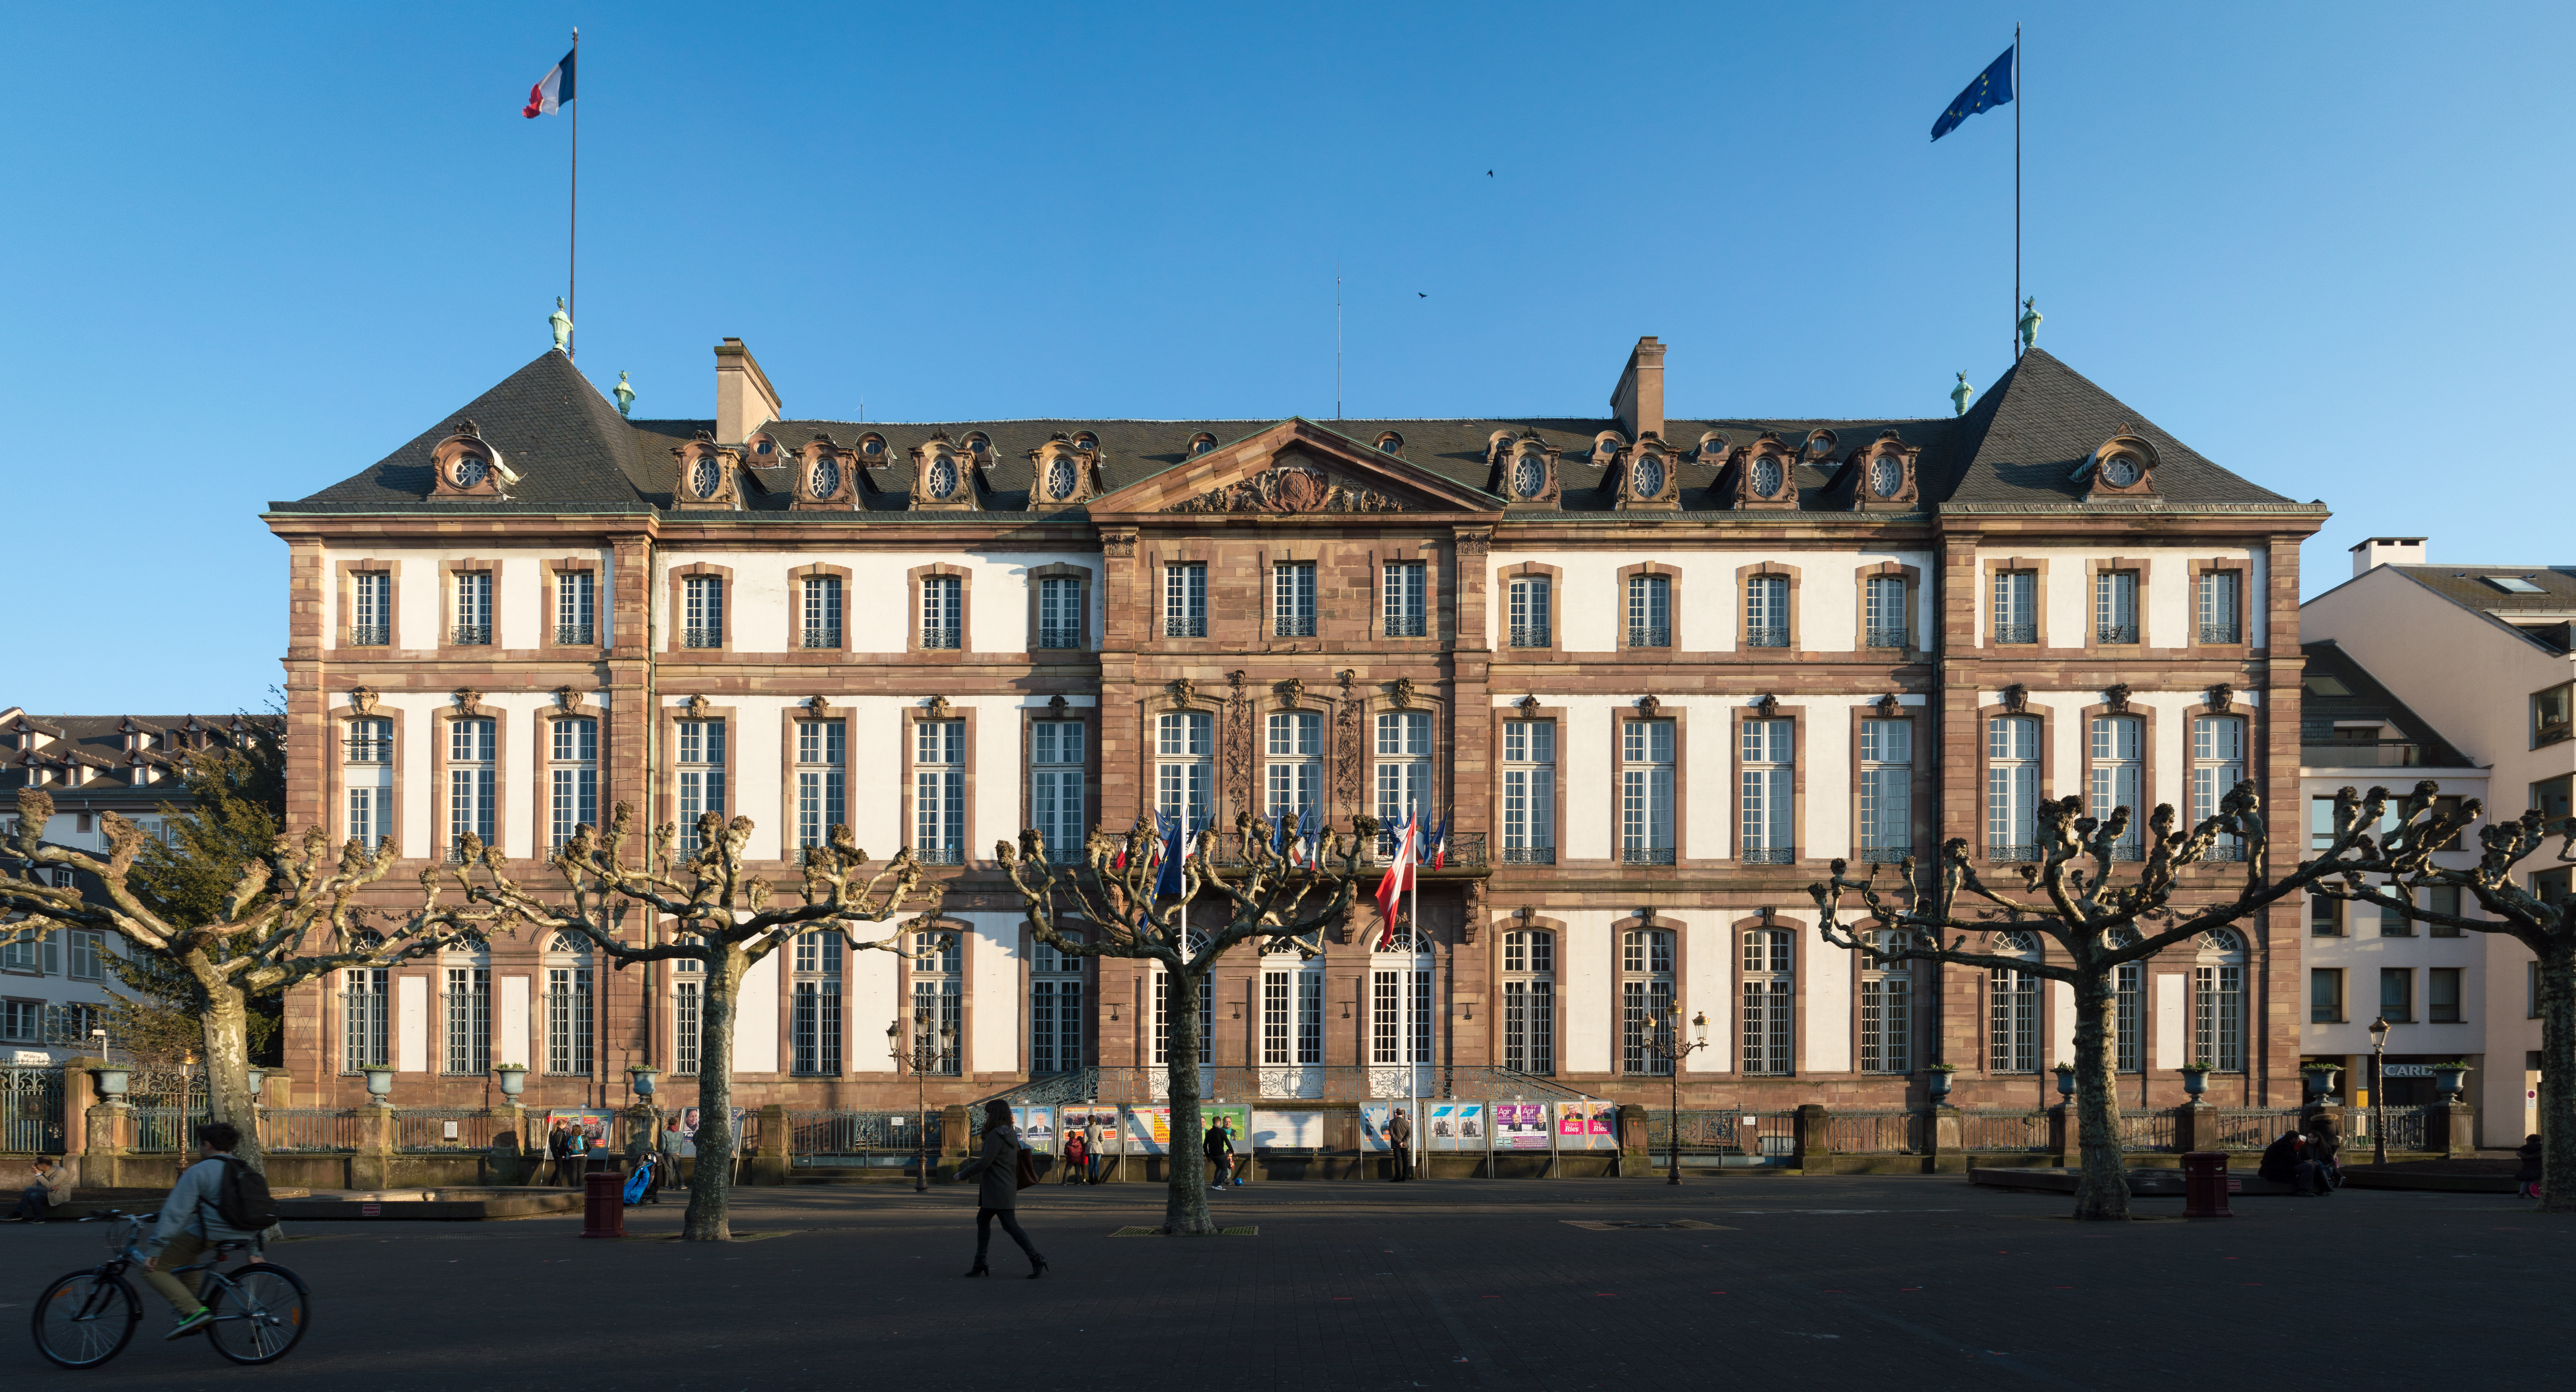 https://upload.wikimedia.org/wikipedia/commons/5/5e/Strasbourg_H%C3%B4tel_de_Hanau.jpg?uselang=fr